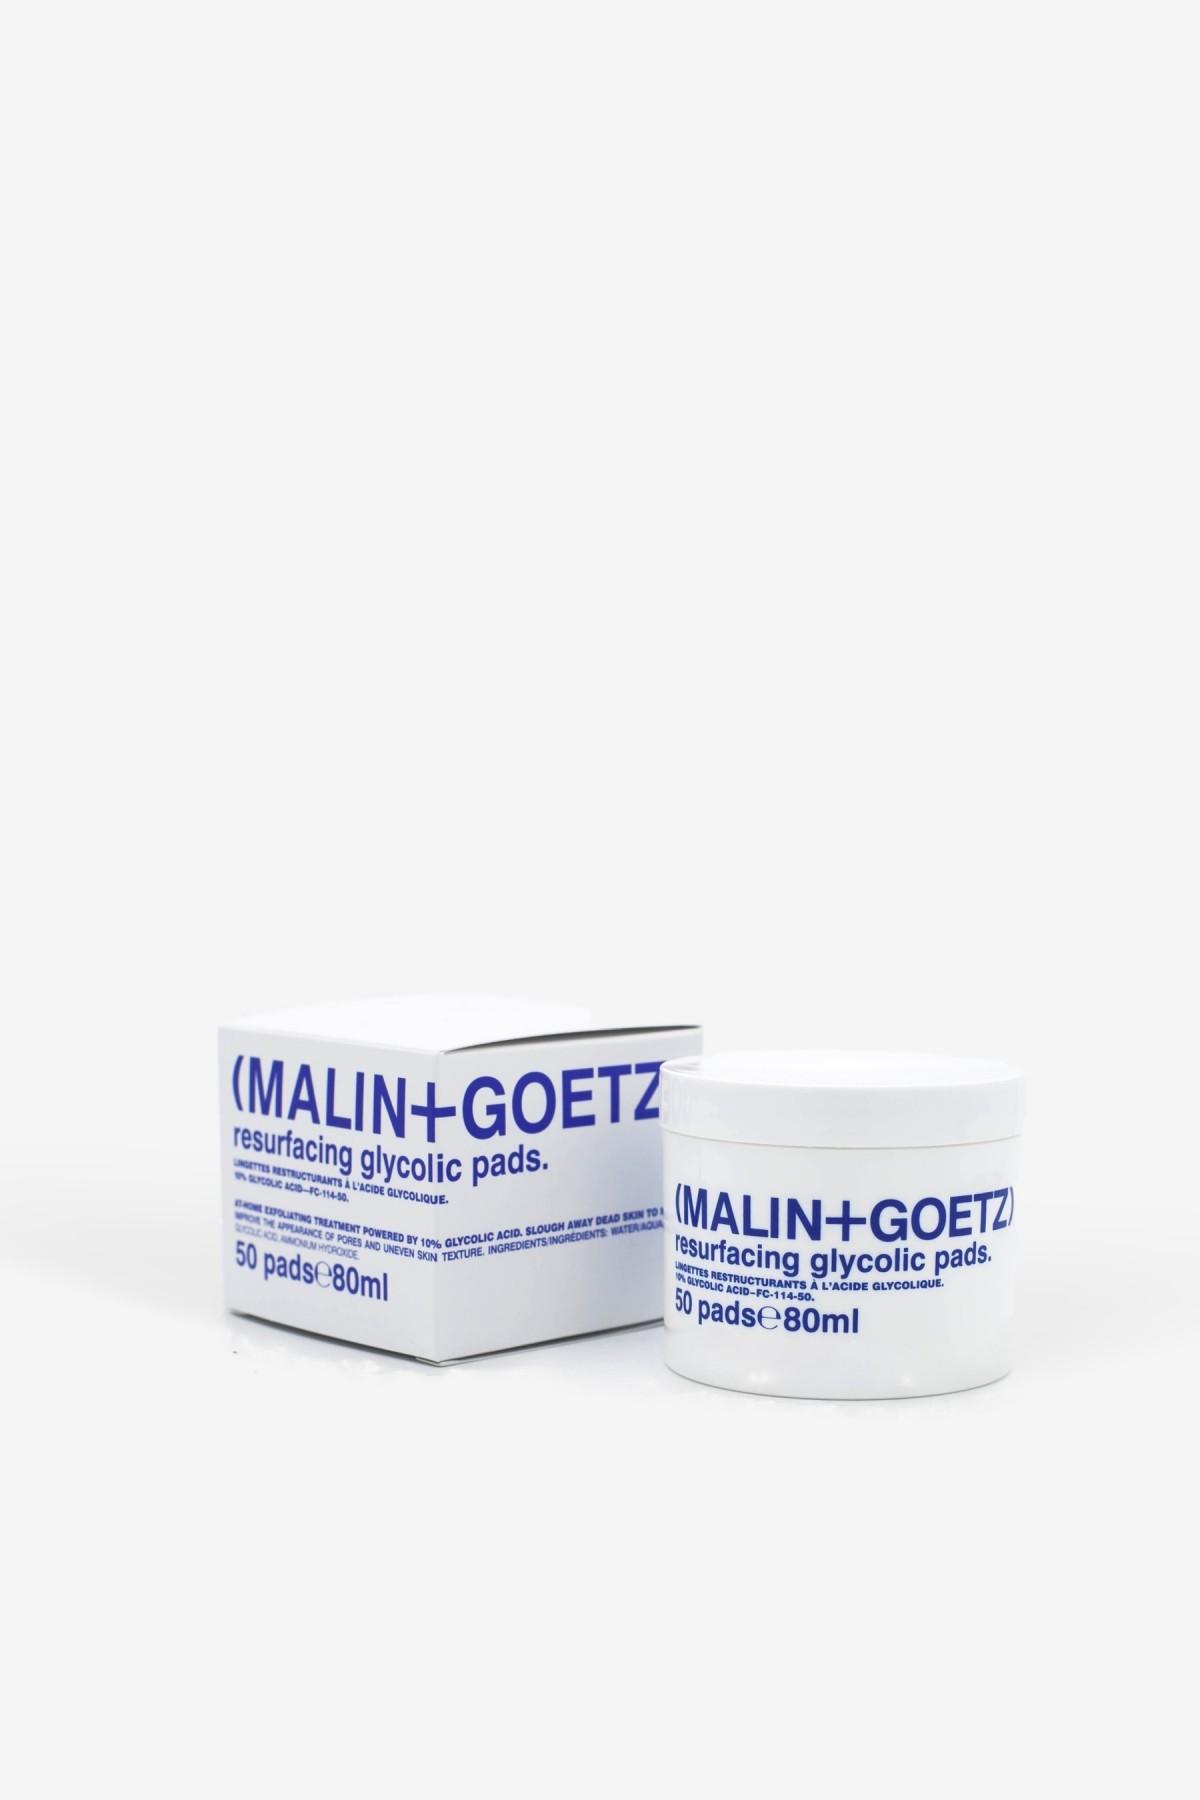 Malin+Goetz Resurfacing Glycolic Acid Pads 80ml in